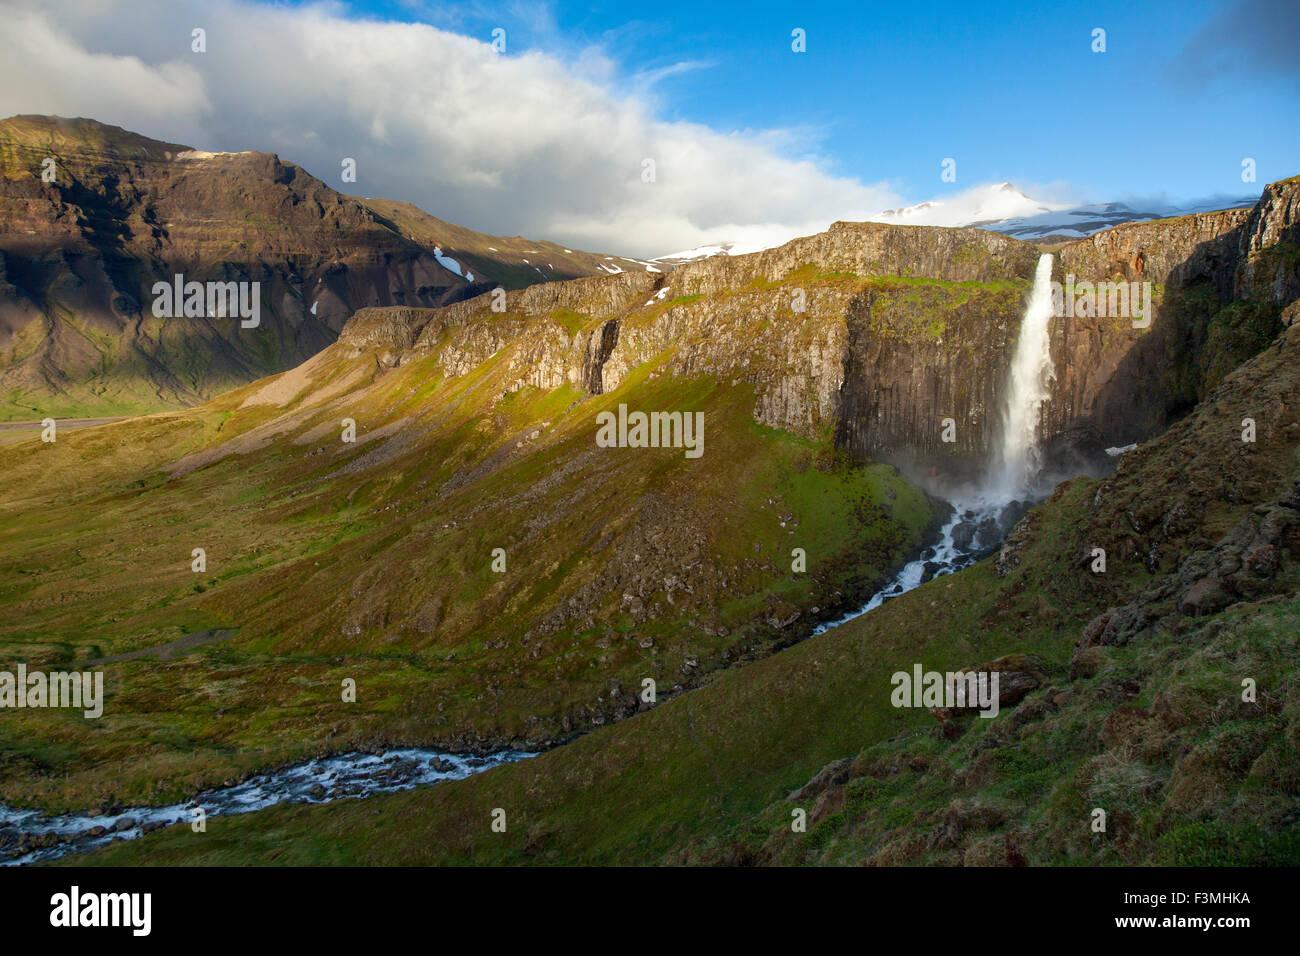 Cascata di montagna vicino a Grundarfjordur, Snaefellsnes Peninsula, Vesturland, Islanda. Immagini Stock